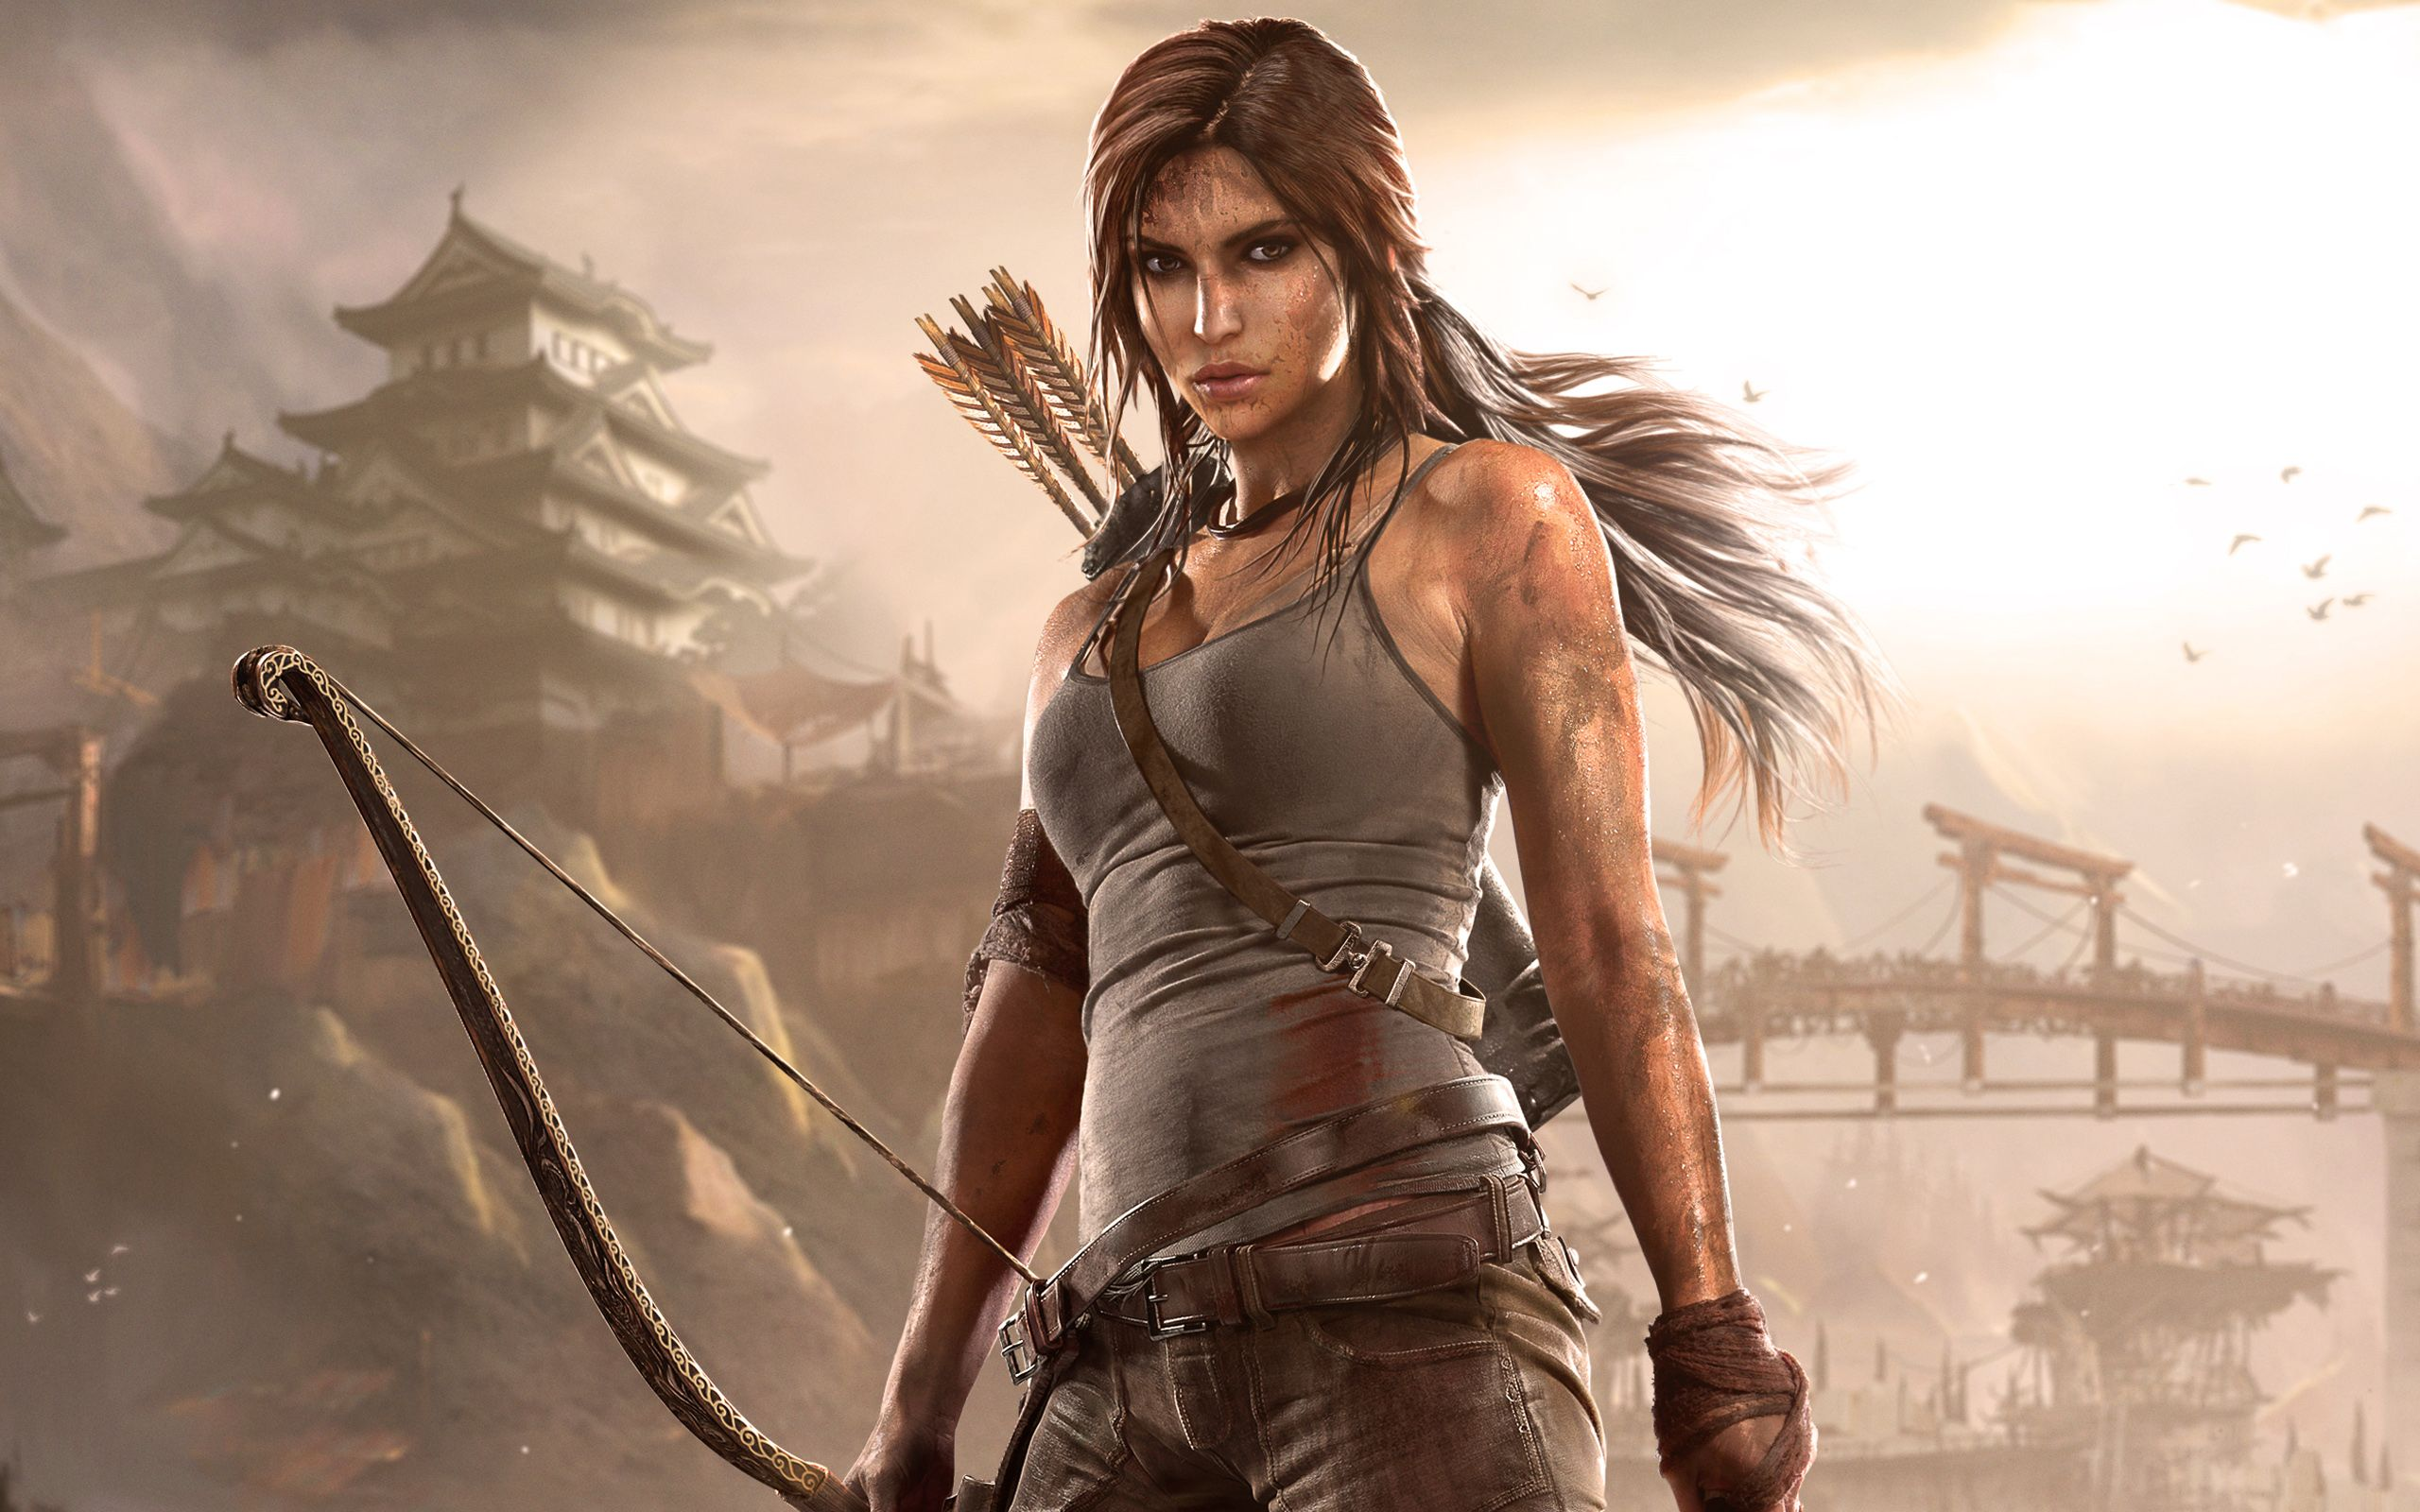 Tomb Raider 2013 Wallpaper Tomb Raider 2013 Tomb Raider